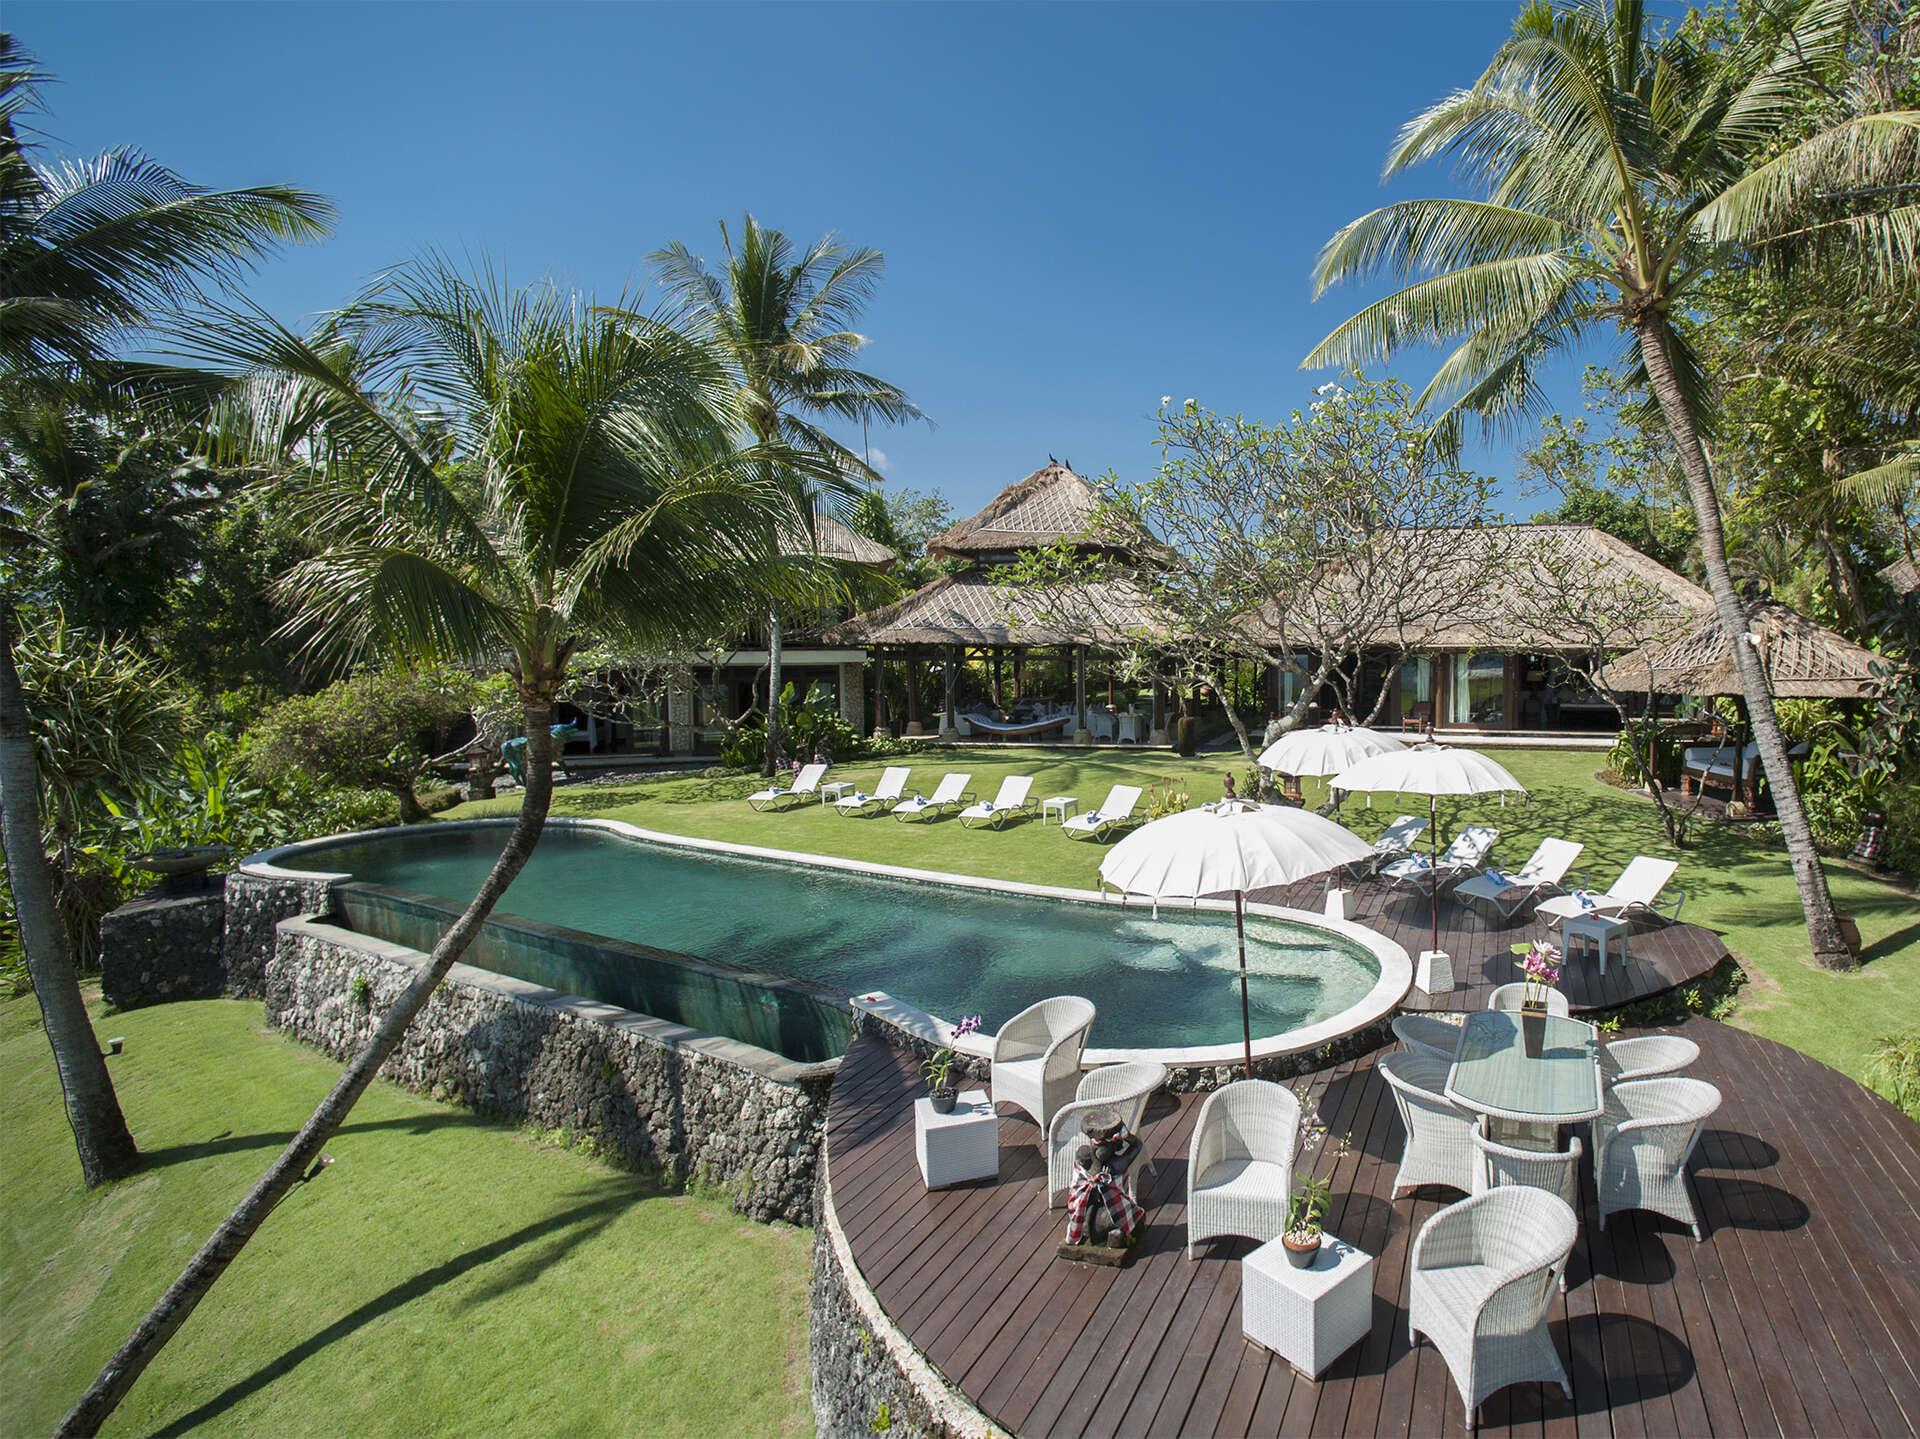 Luxury villa rentals asia - Indonesia - Bali - Canggu - Sungai Tinggi - Image 1/27